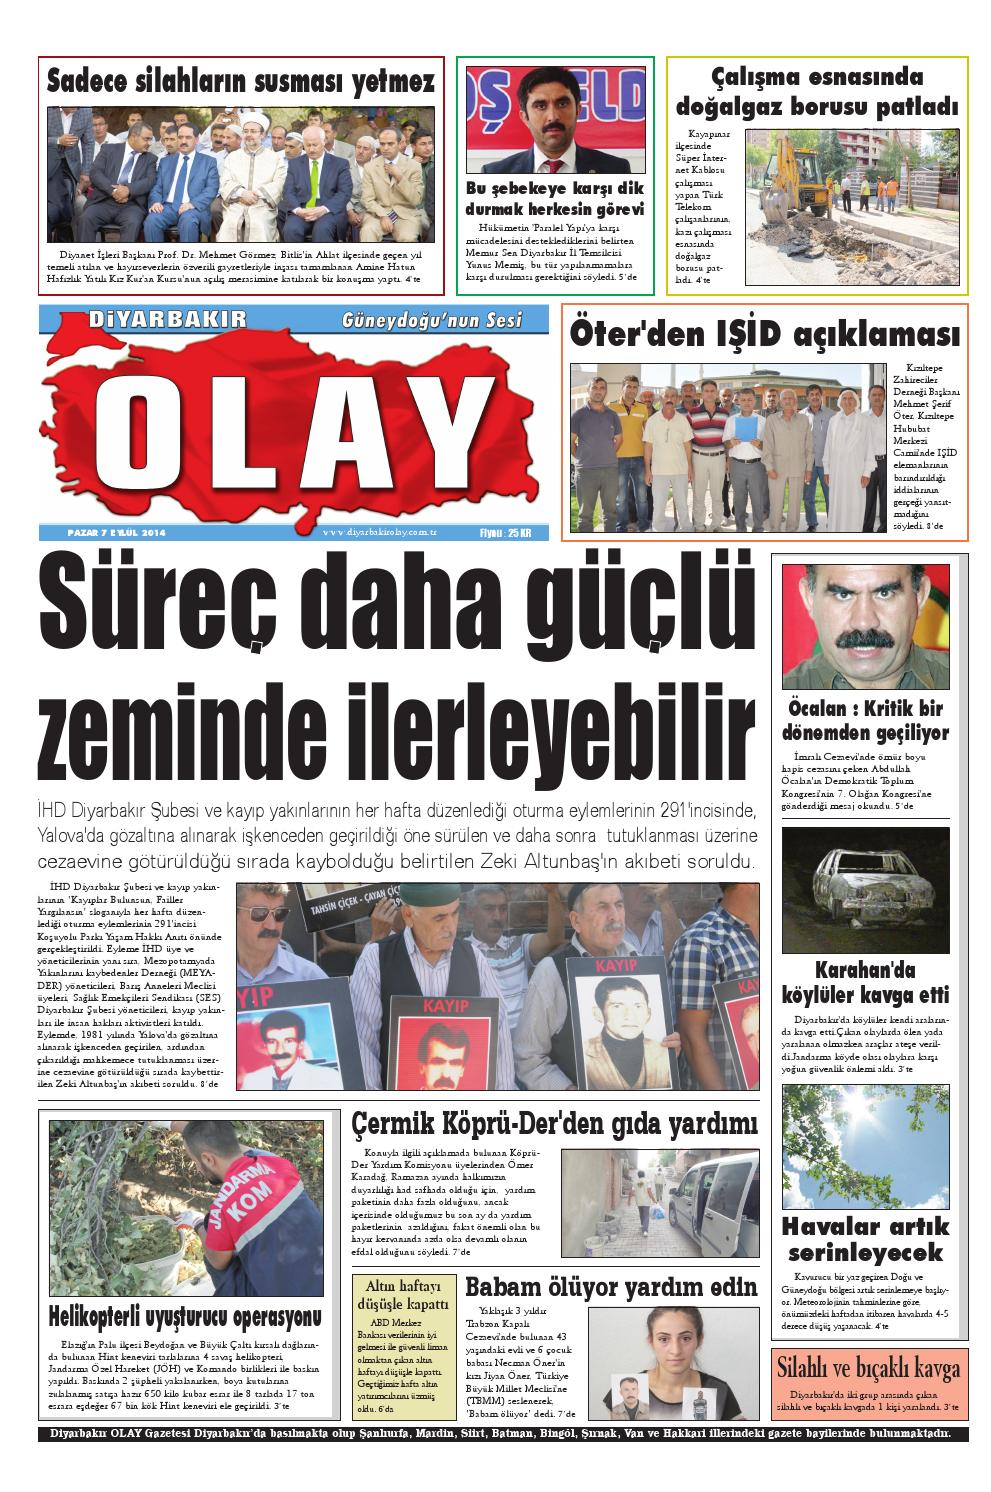 07 09 2014 Gazete Sayfalari By Diyarbakir Olaygazetesi Issuu